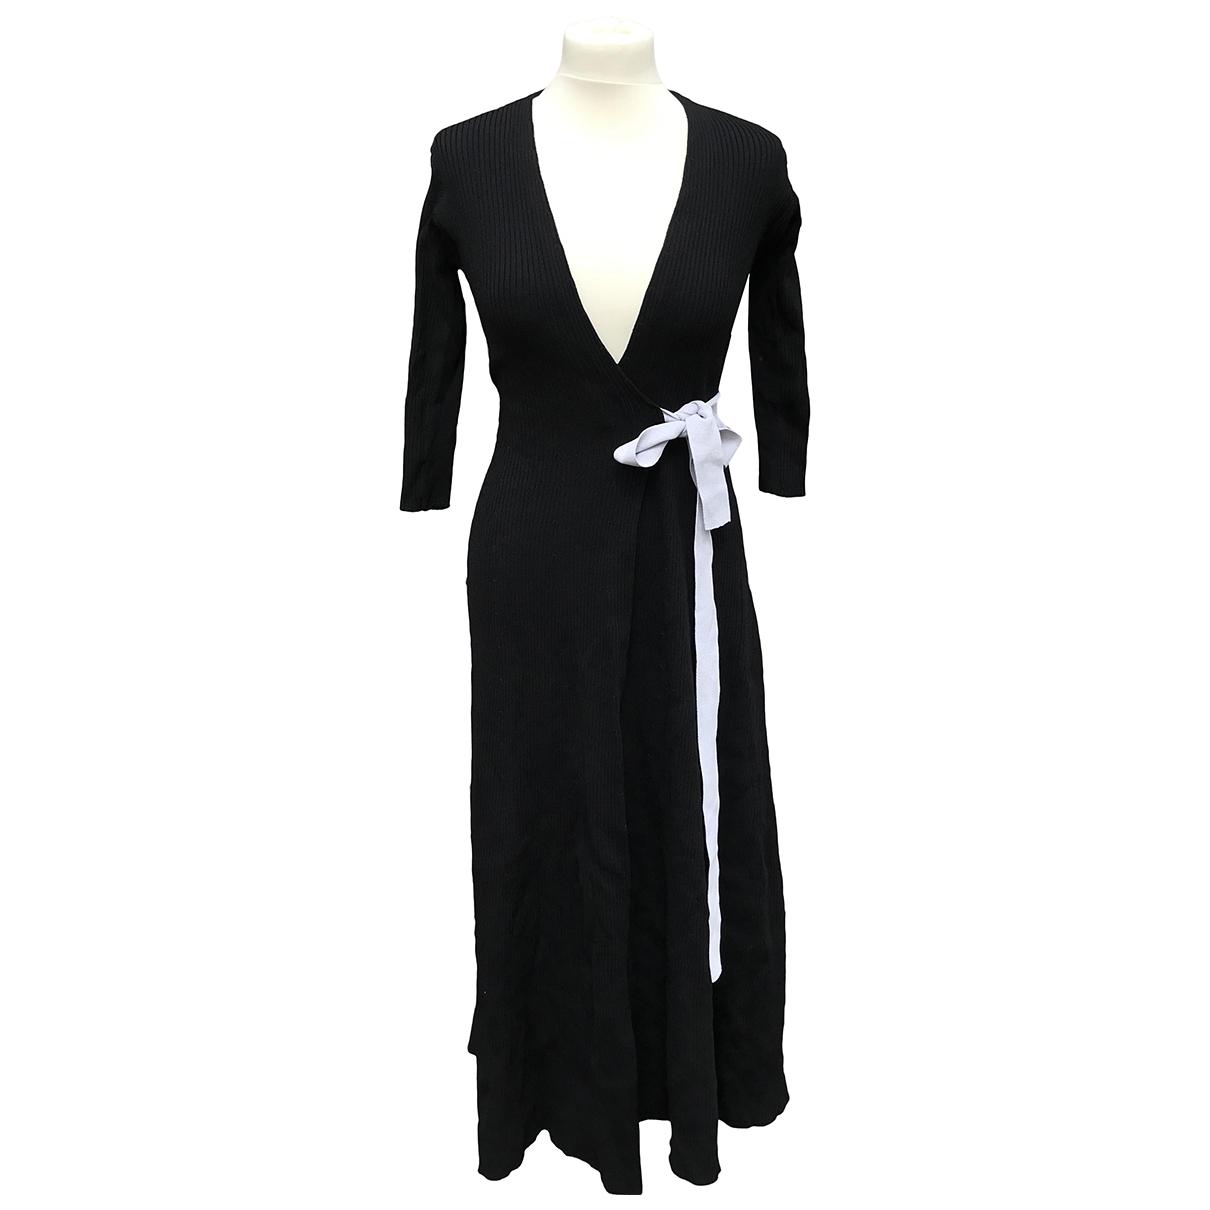 Maje \N Black jacket for Women 1 0-5